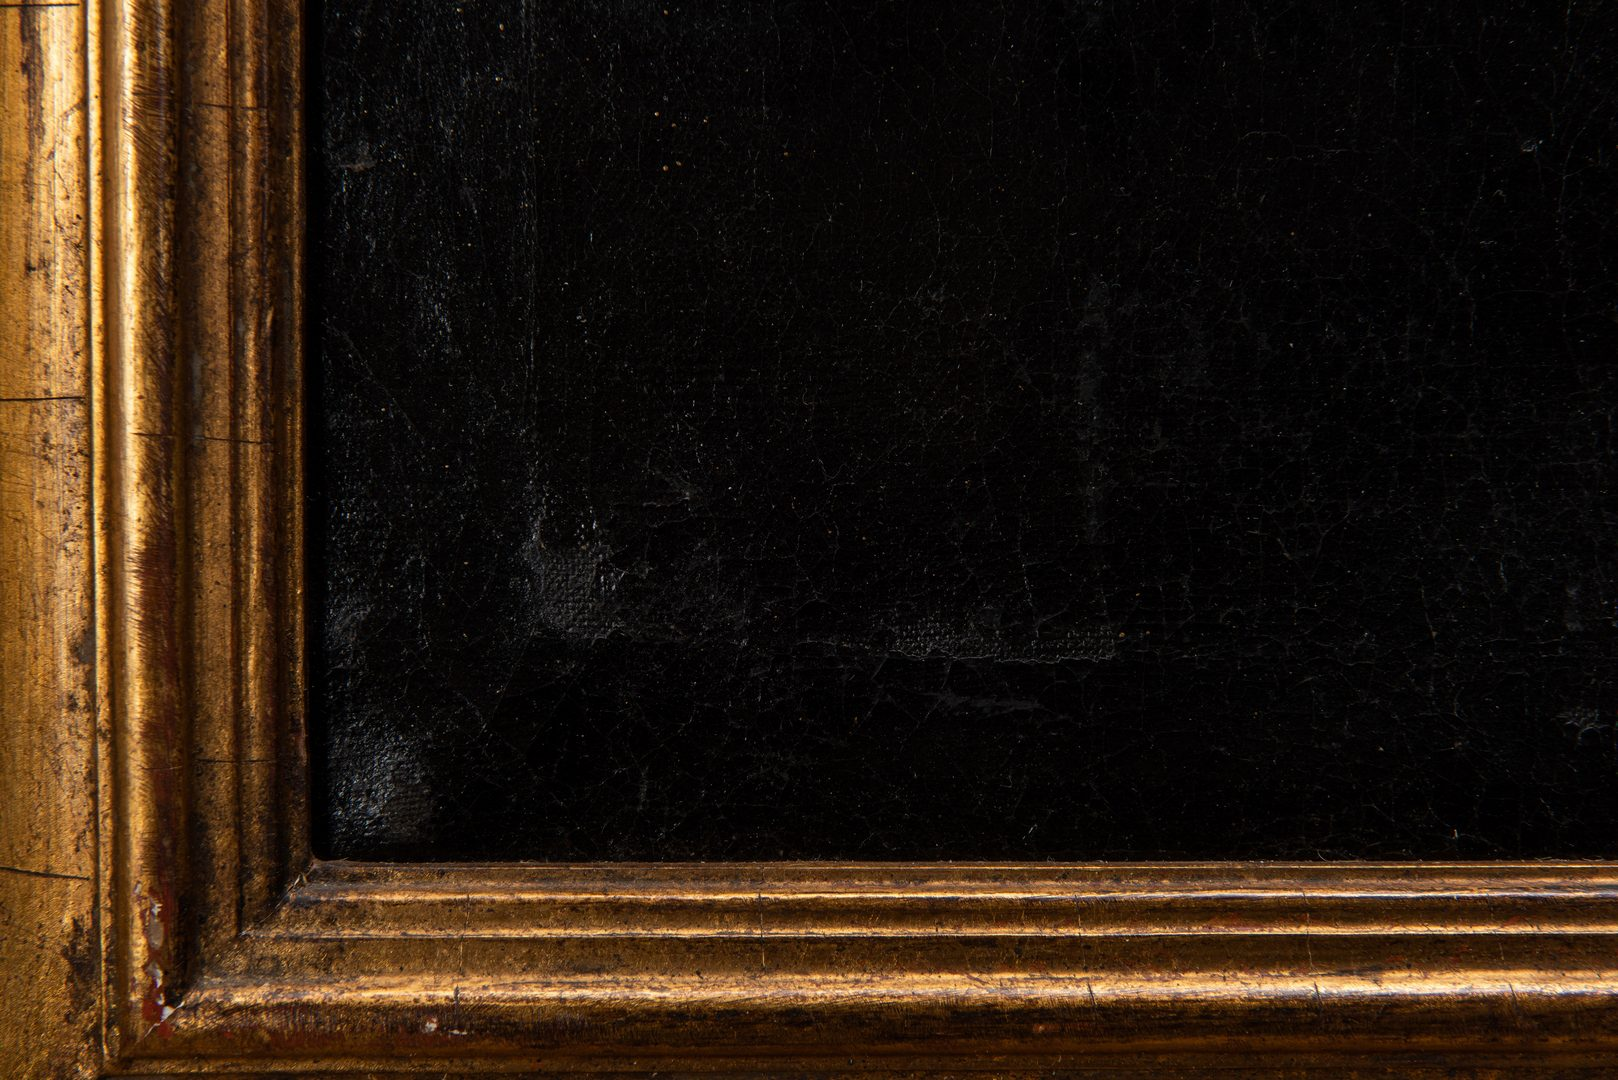 Lot 103: Portrait of a Woman, poss. John Grimes, TN